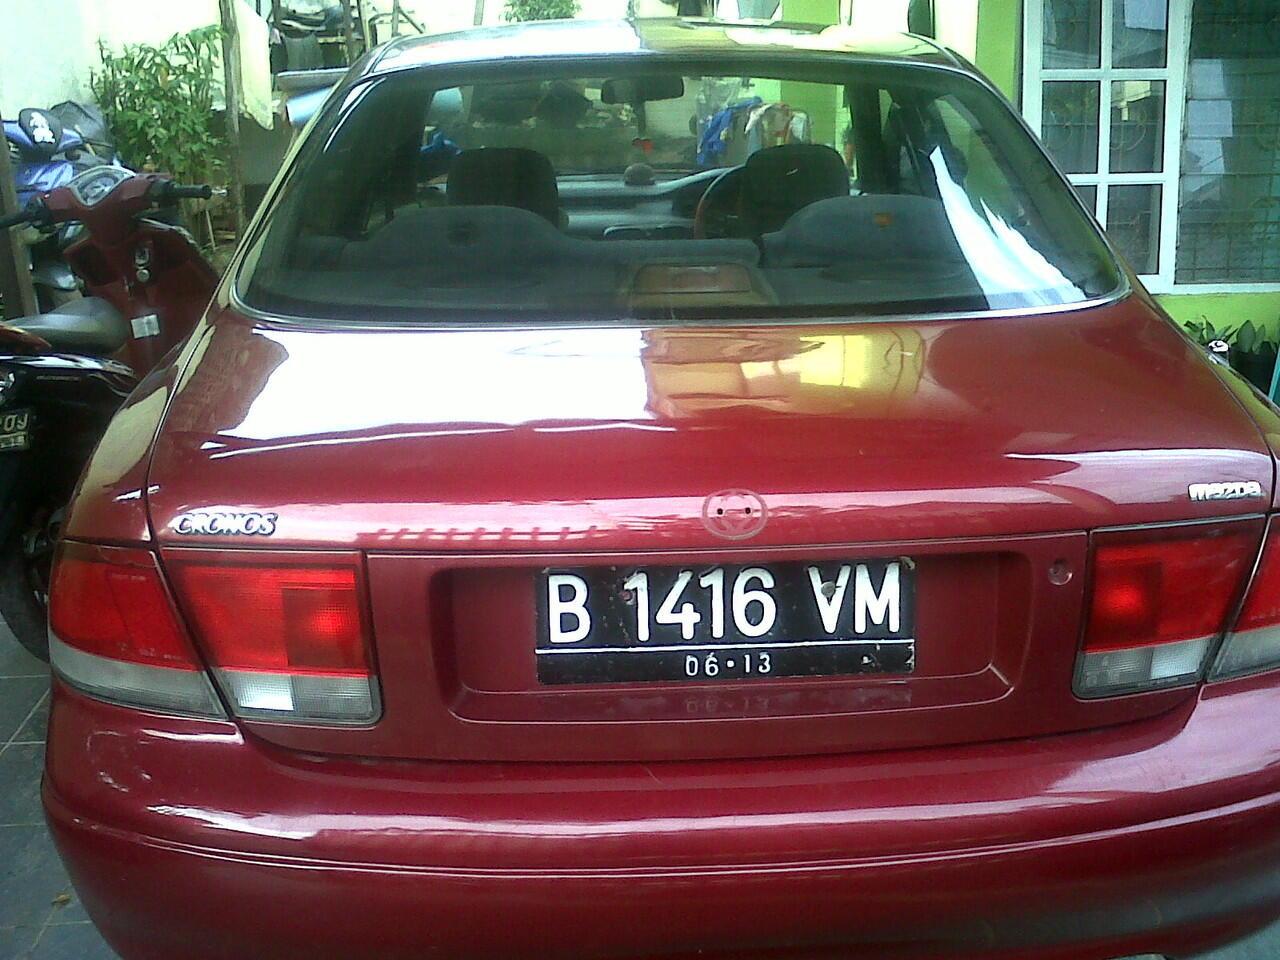 JUAL Mazda 626 Cronos th 96